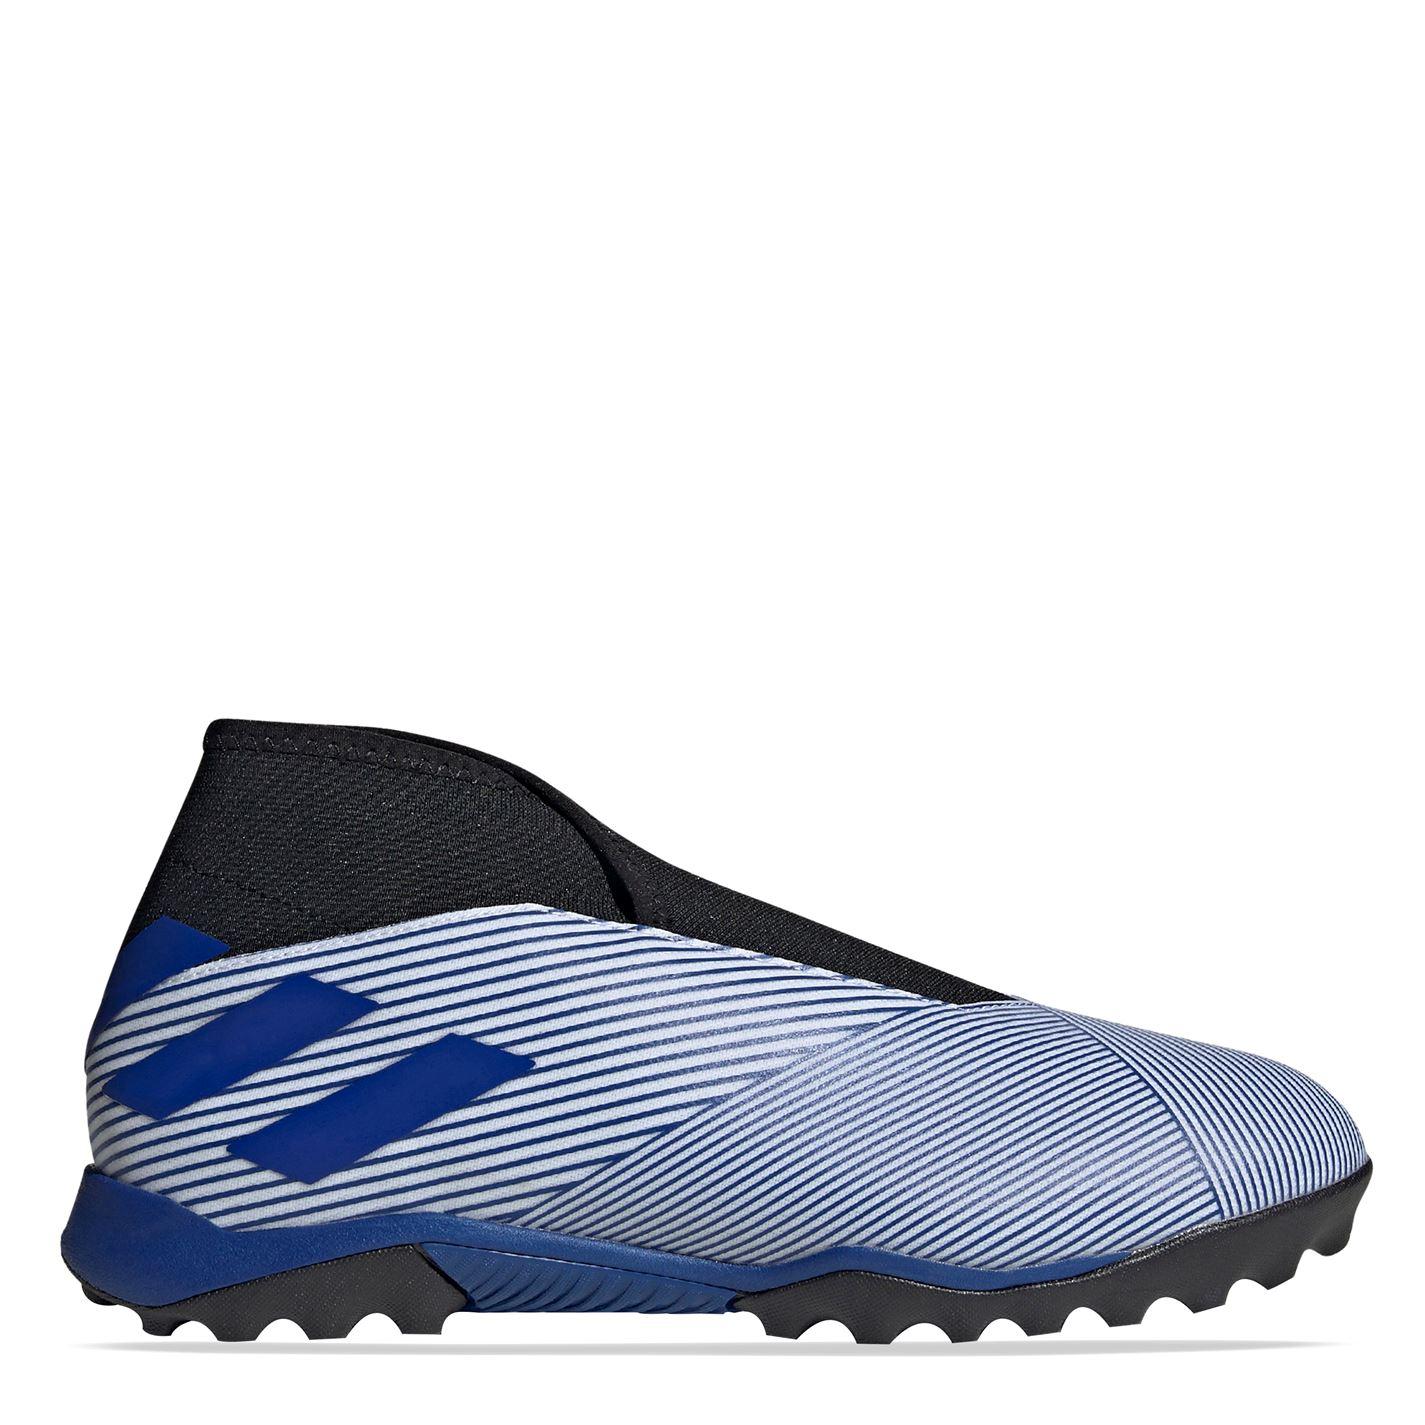 adidas astro turf trainers men